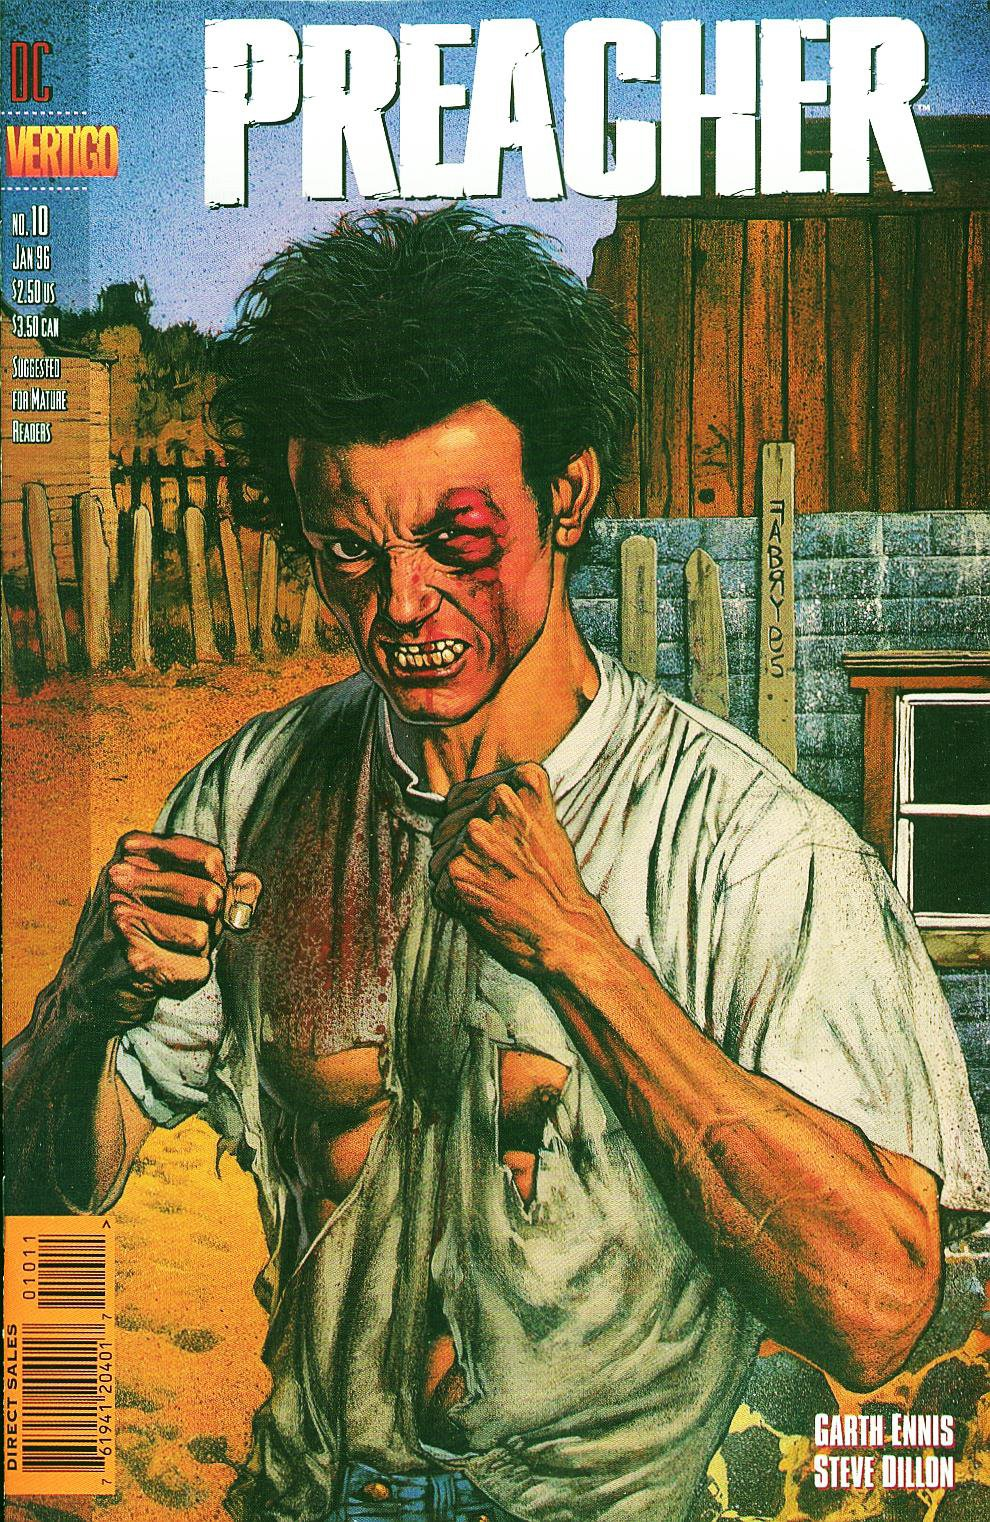 Комиксы Онлайн - Проповедник - # 10 - Страница №1 - Preacher - Preacher # 10